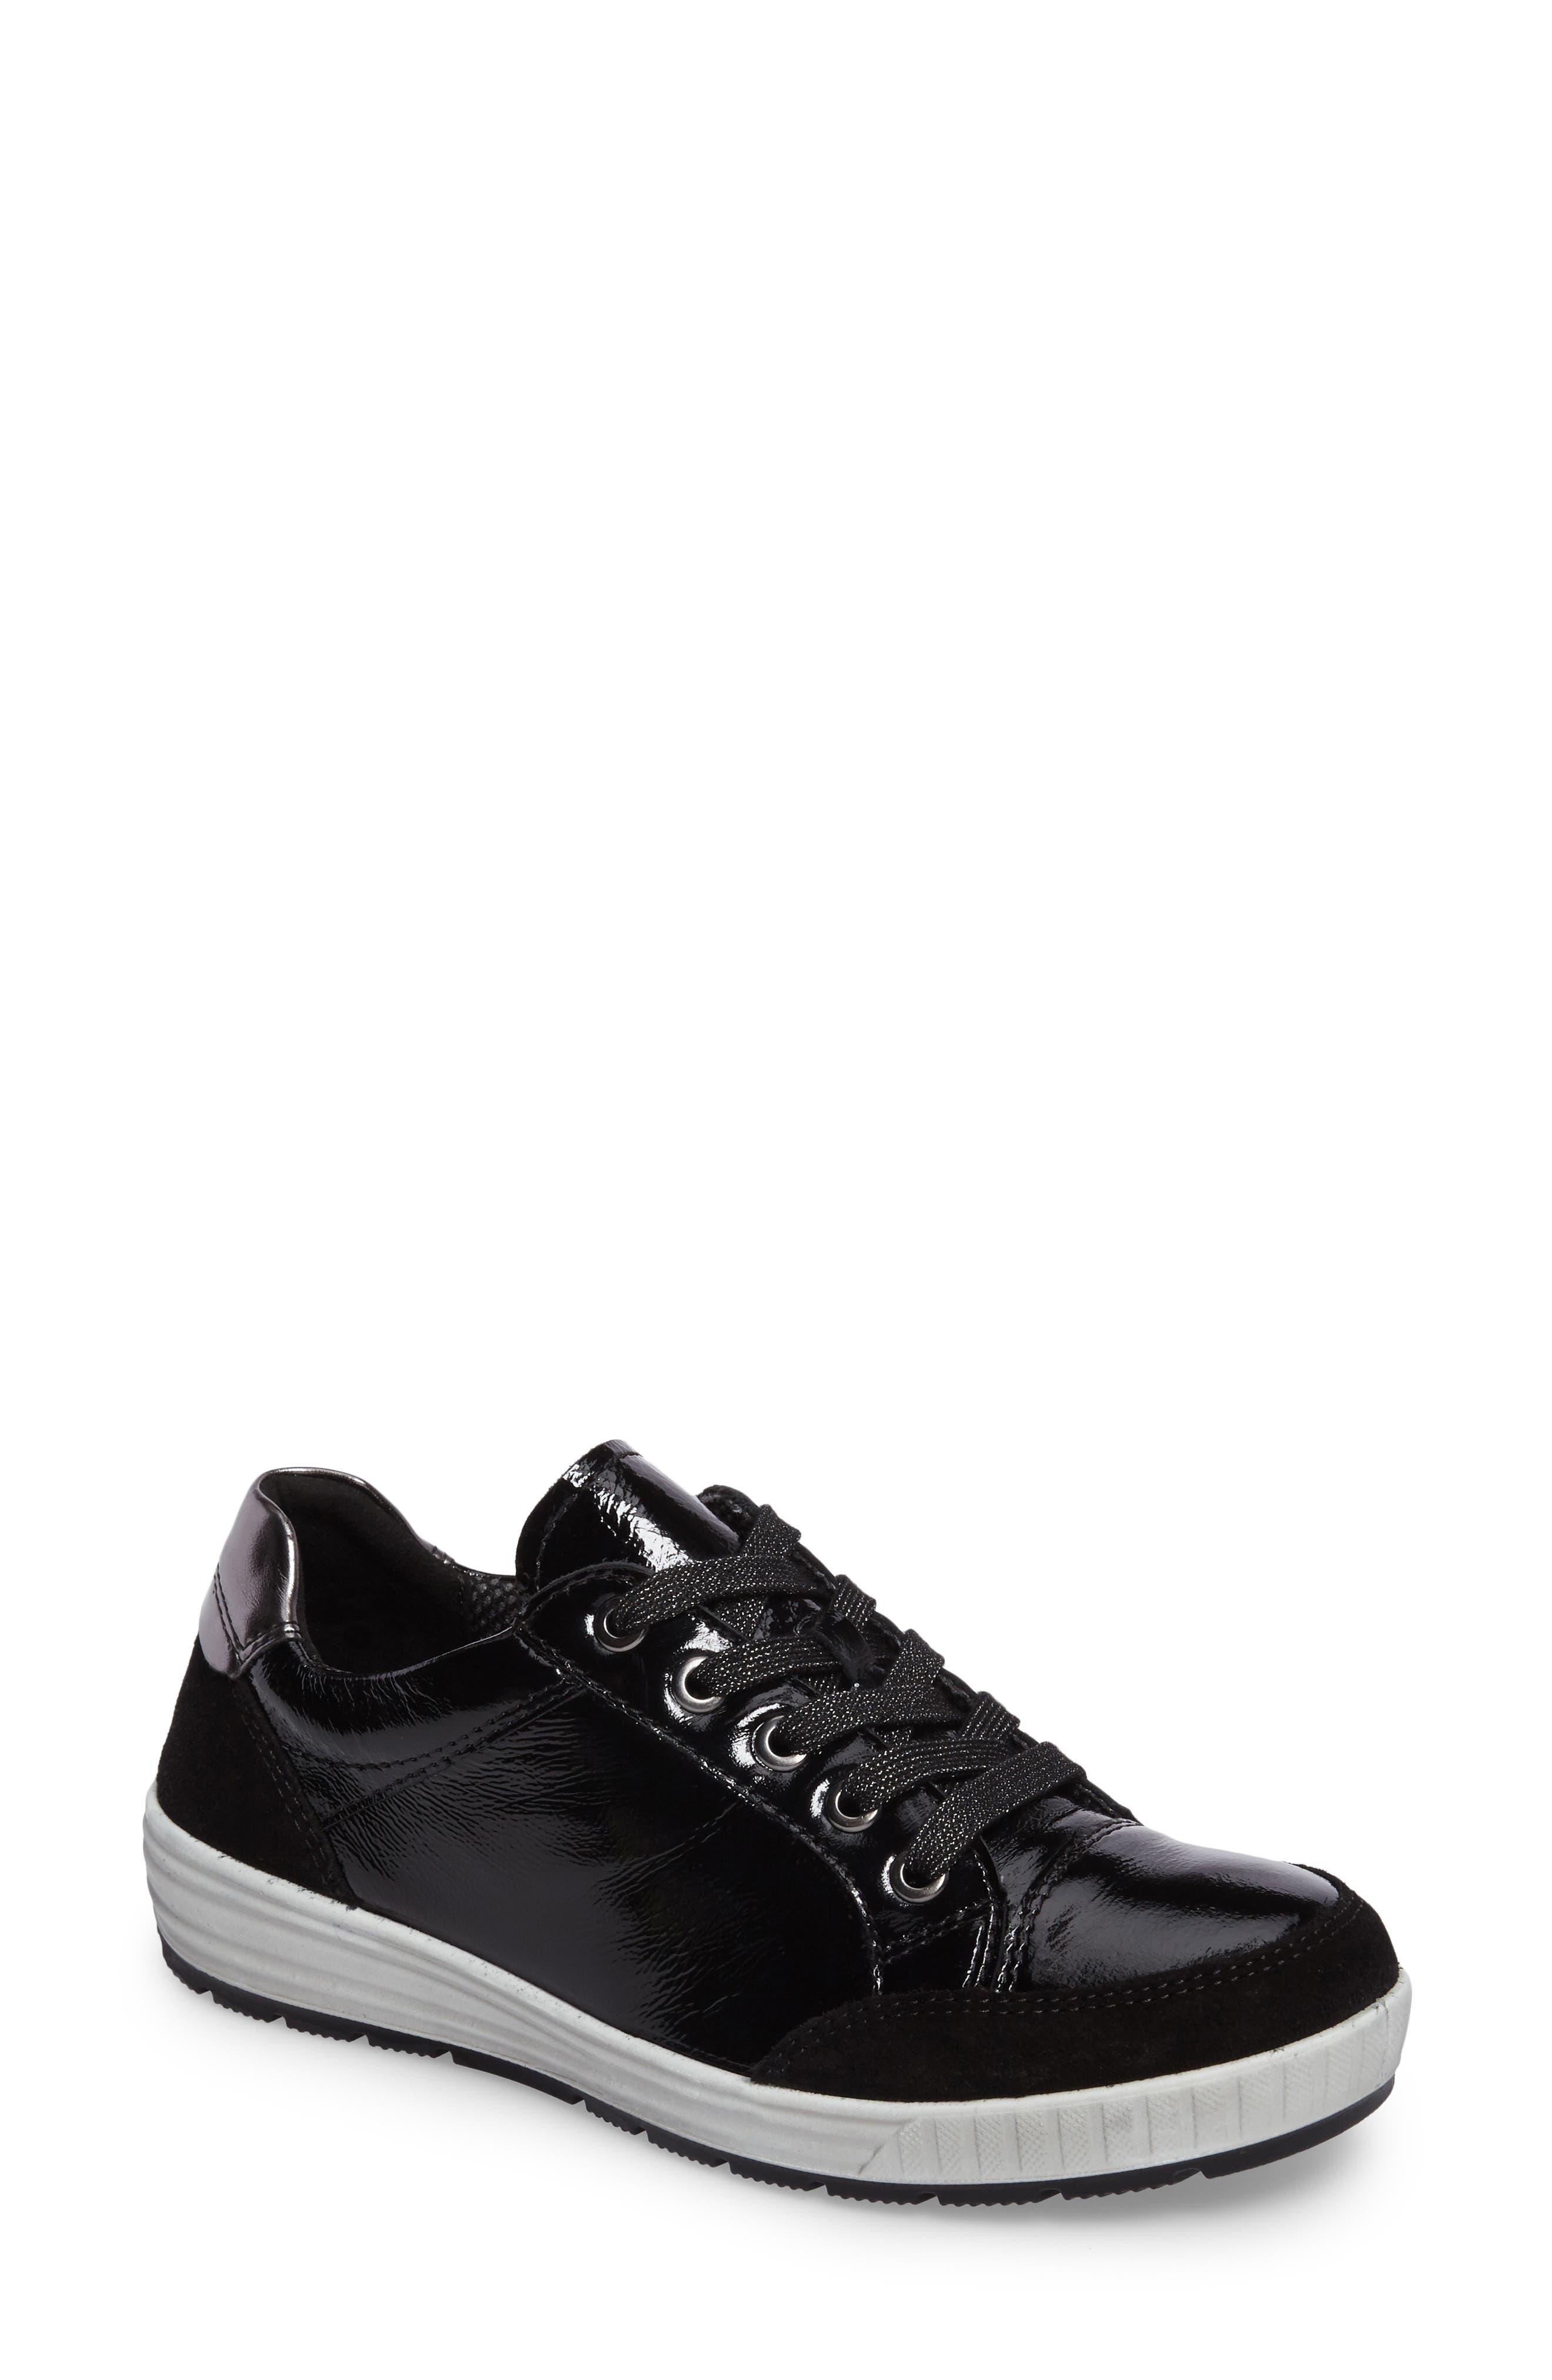 Nicole Sneaker,                             Main thumbnail 1, color,                             Black Leather